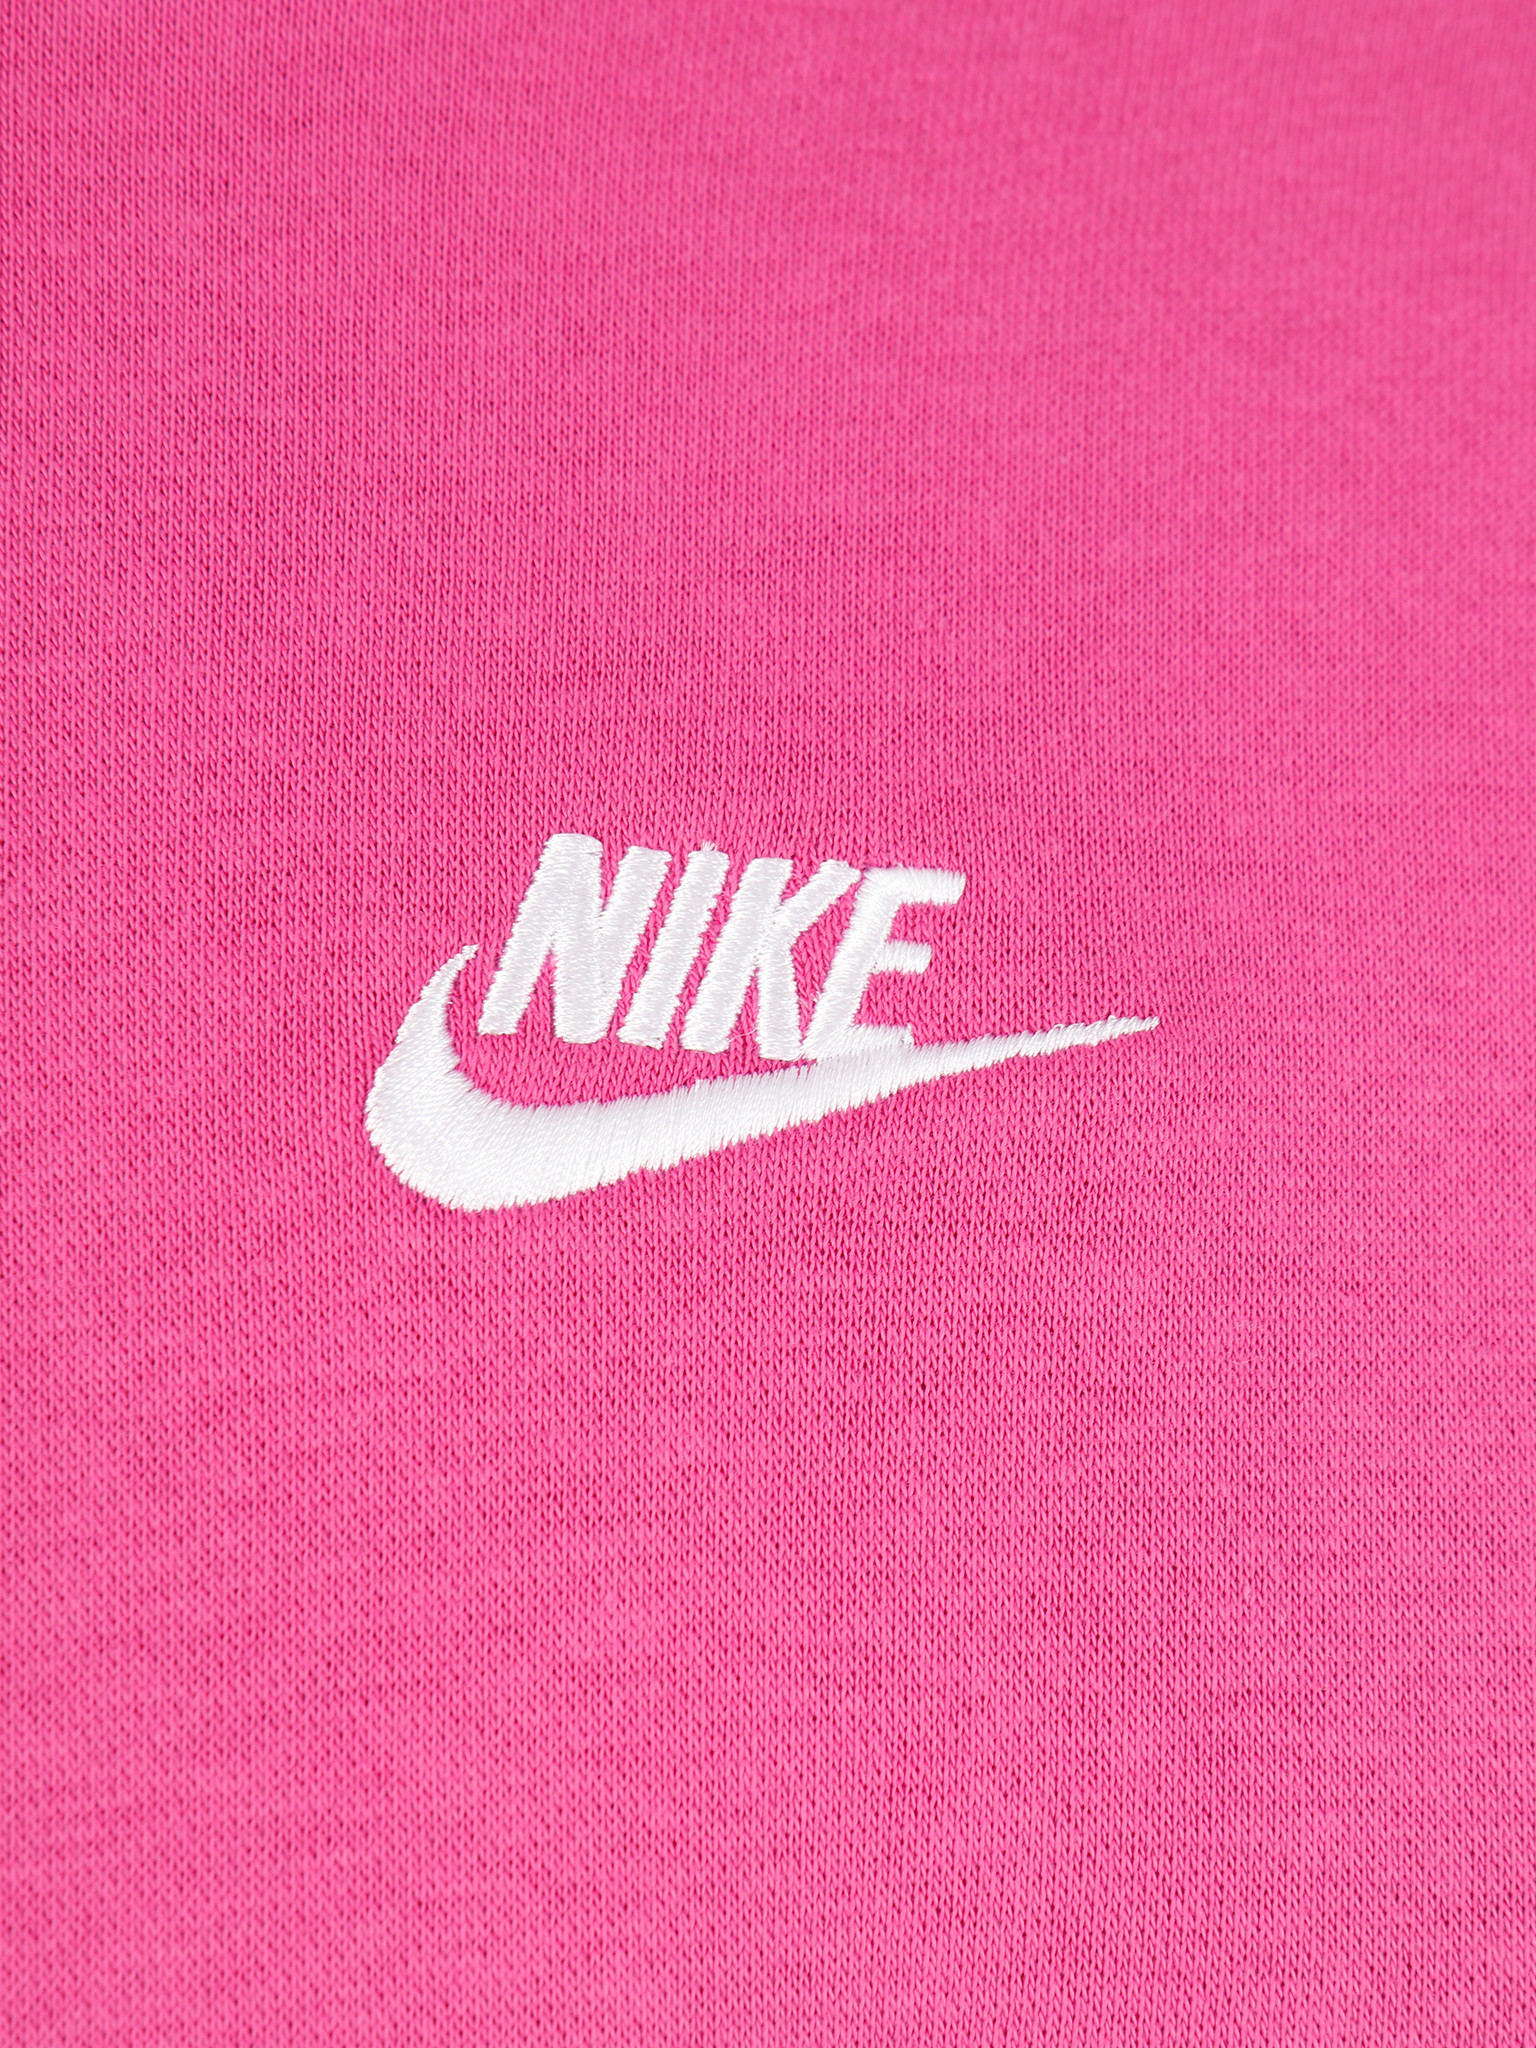 Nike Nike NSW Club Hoodie Po Bb Active Fuchsia Cosmic Fuchsia White BV2654-623